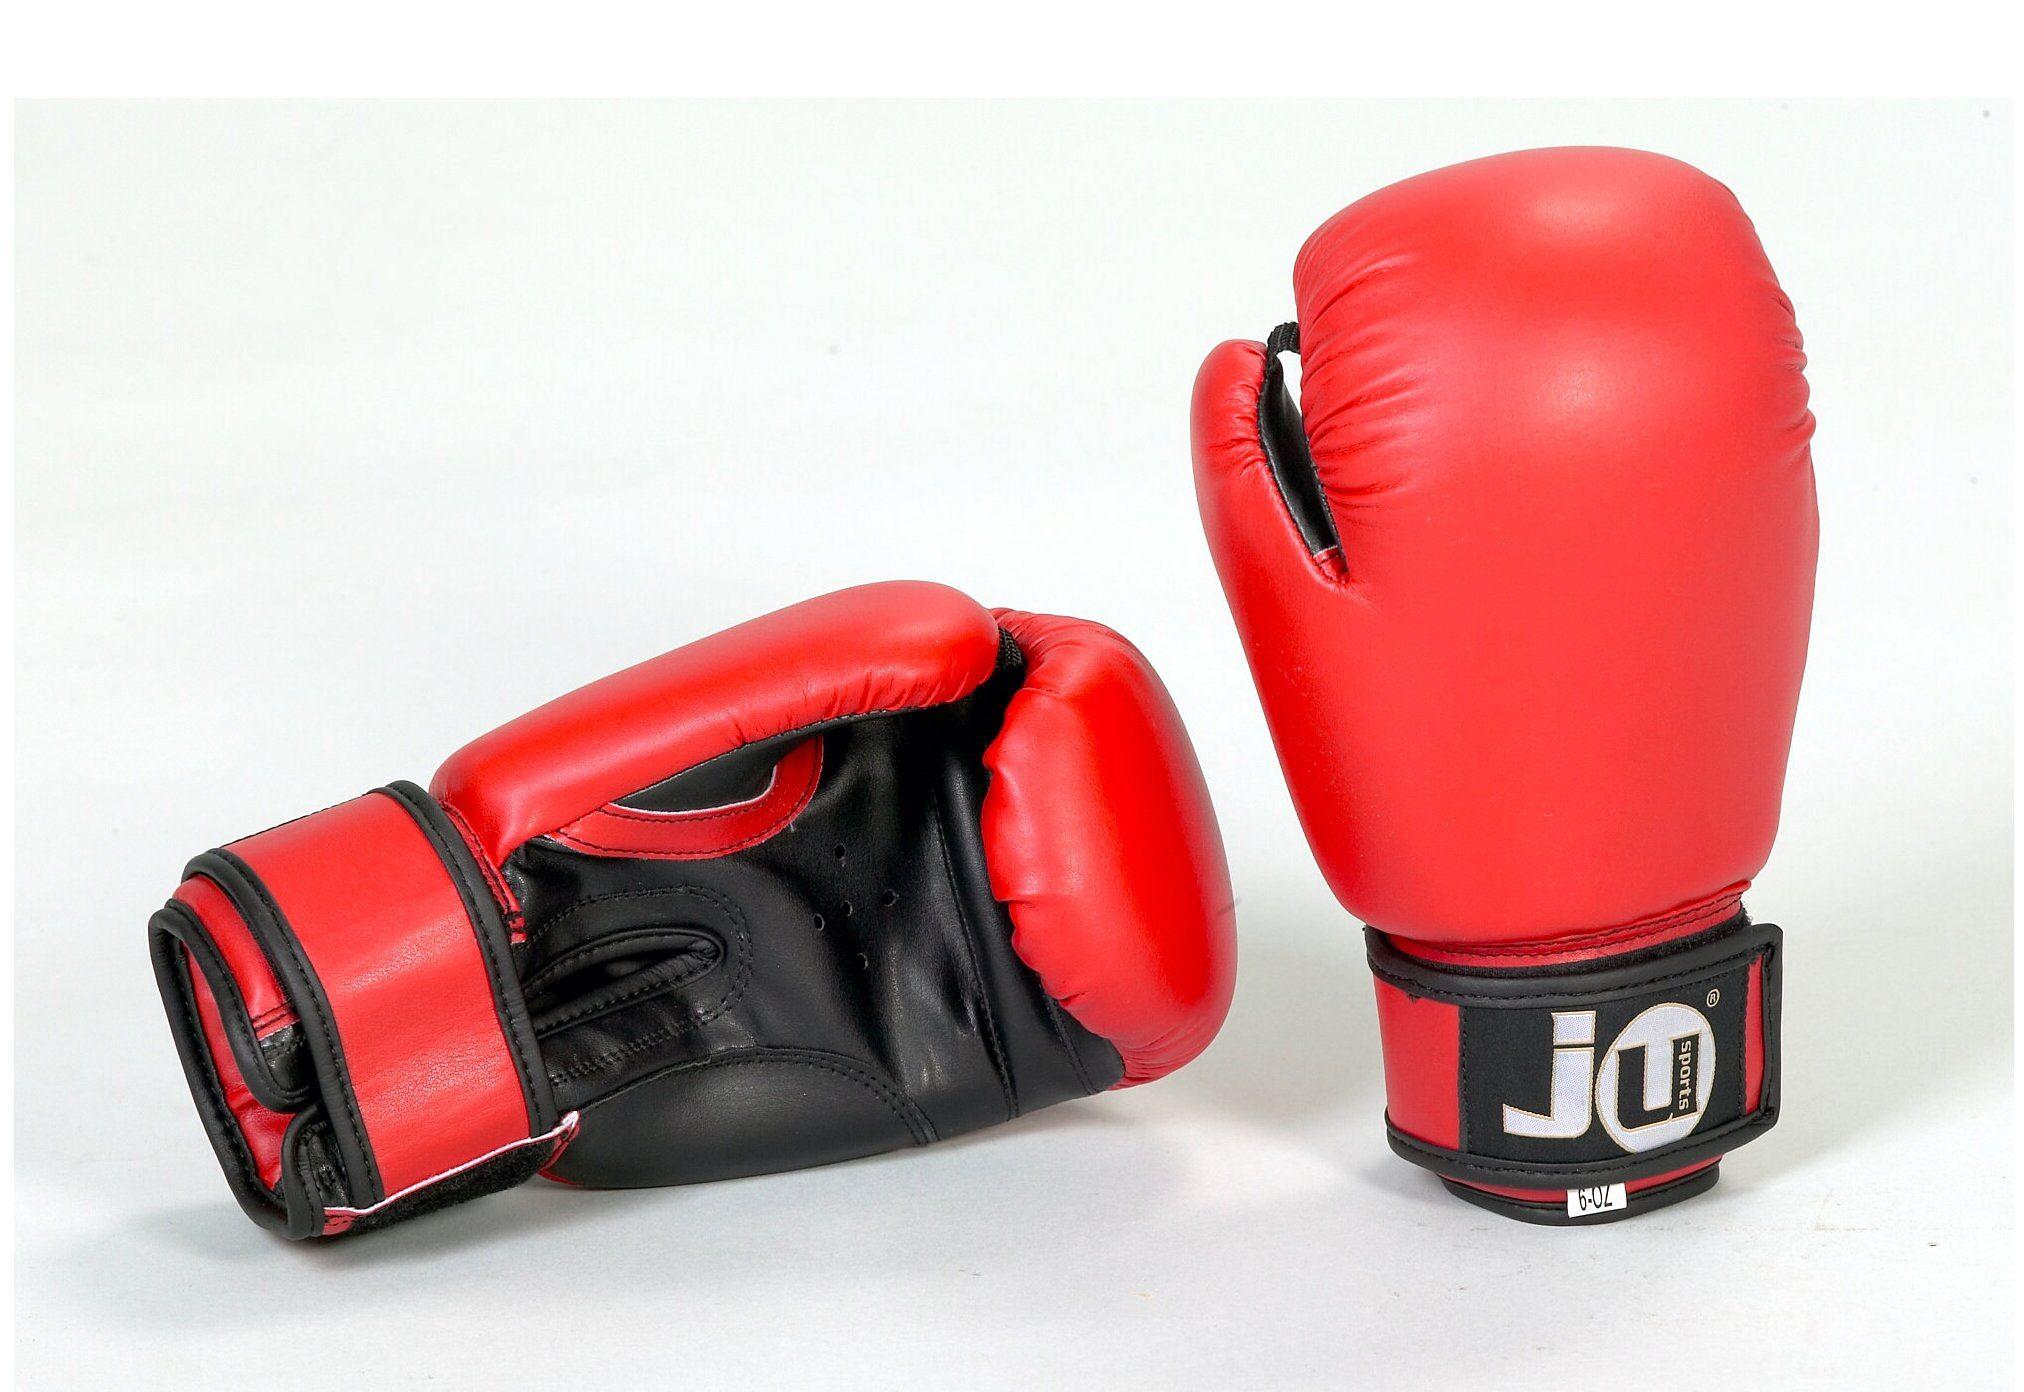 Boxhandschuhe für Kinder, Ju-Sports, »Special 6 oz« (1 Paar)